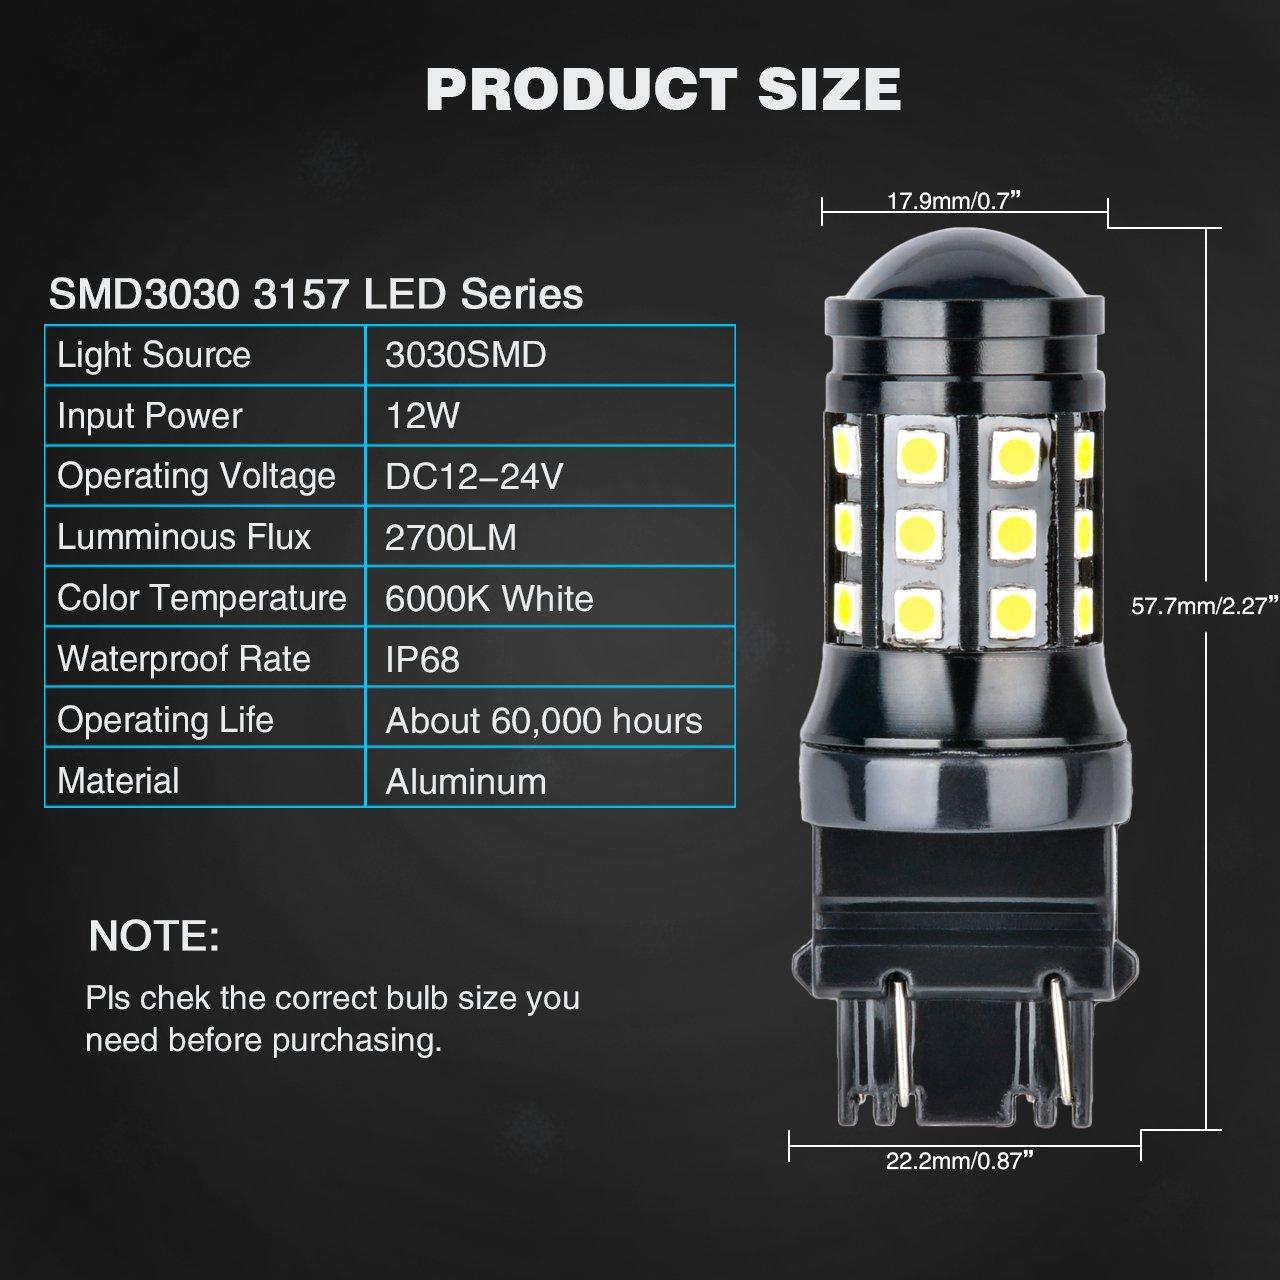 NATGIC Super Bright 2PCS 2700 Lumens 3030 27SMD 3157 3047 3057 3457 3155 3156 3456 Lens LED Brake Light Turn Signals Bulbs Reverse Tail Lights 12V-24V 6000K White